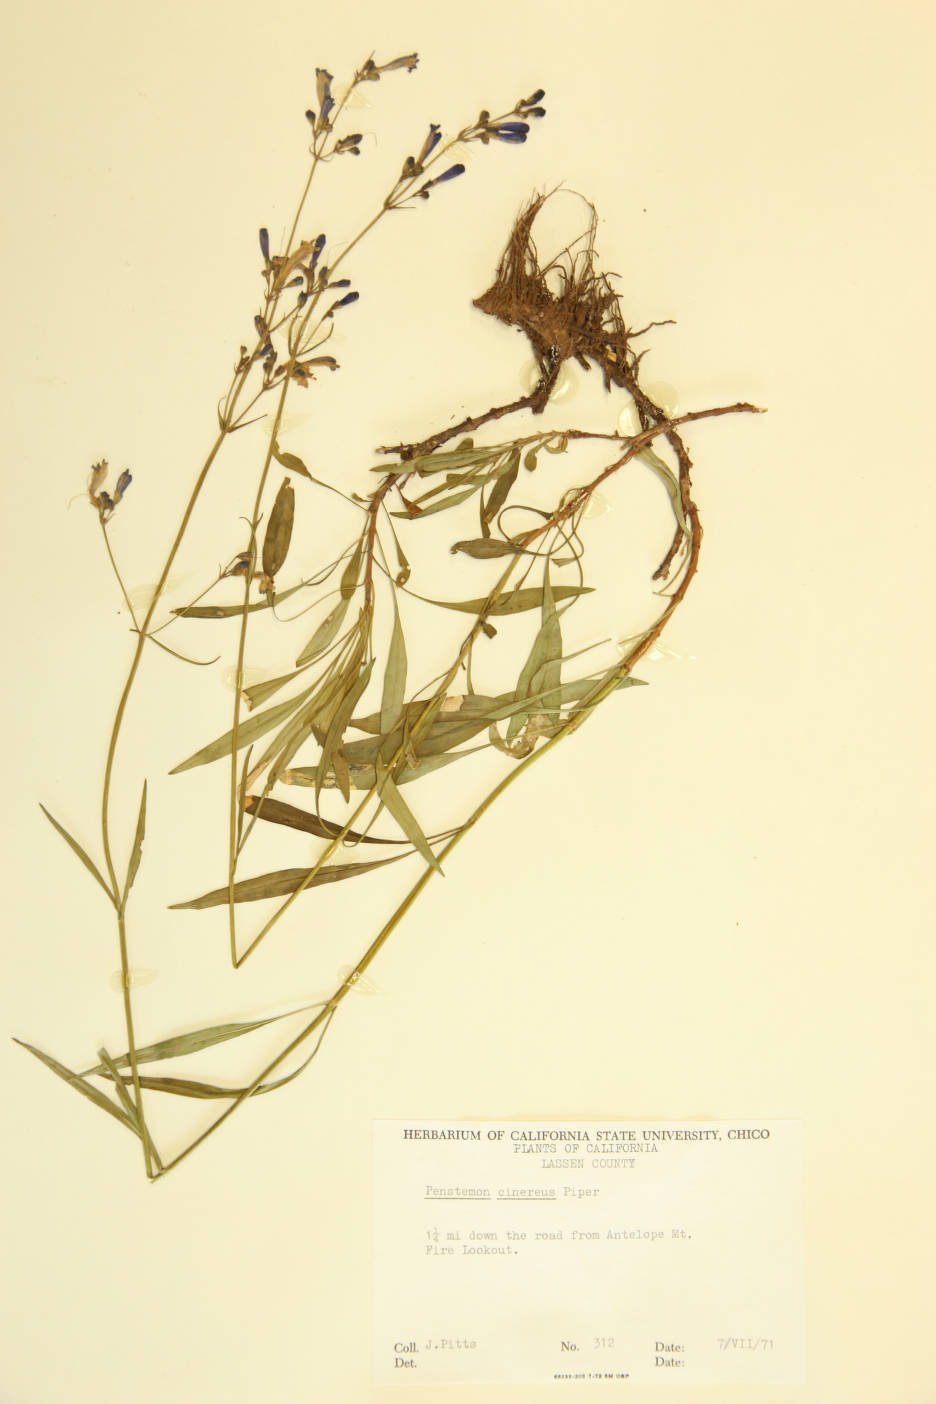 Image of Penstemon cinereus